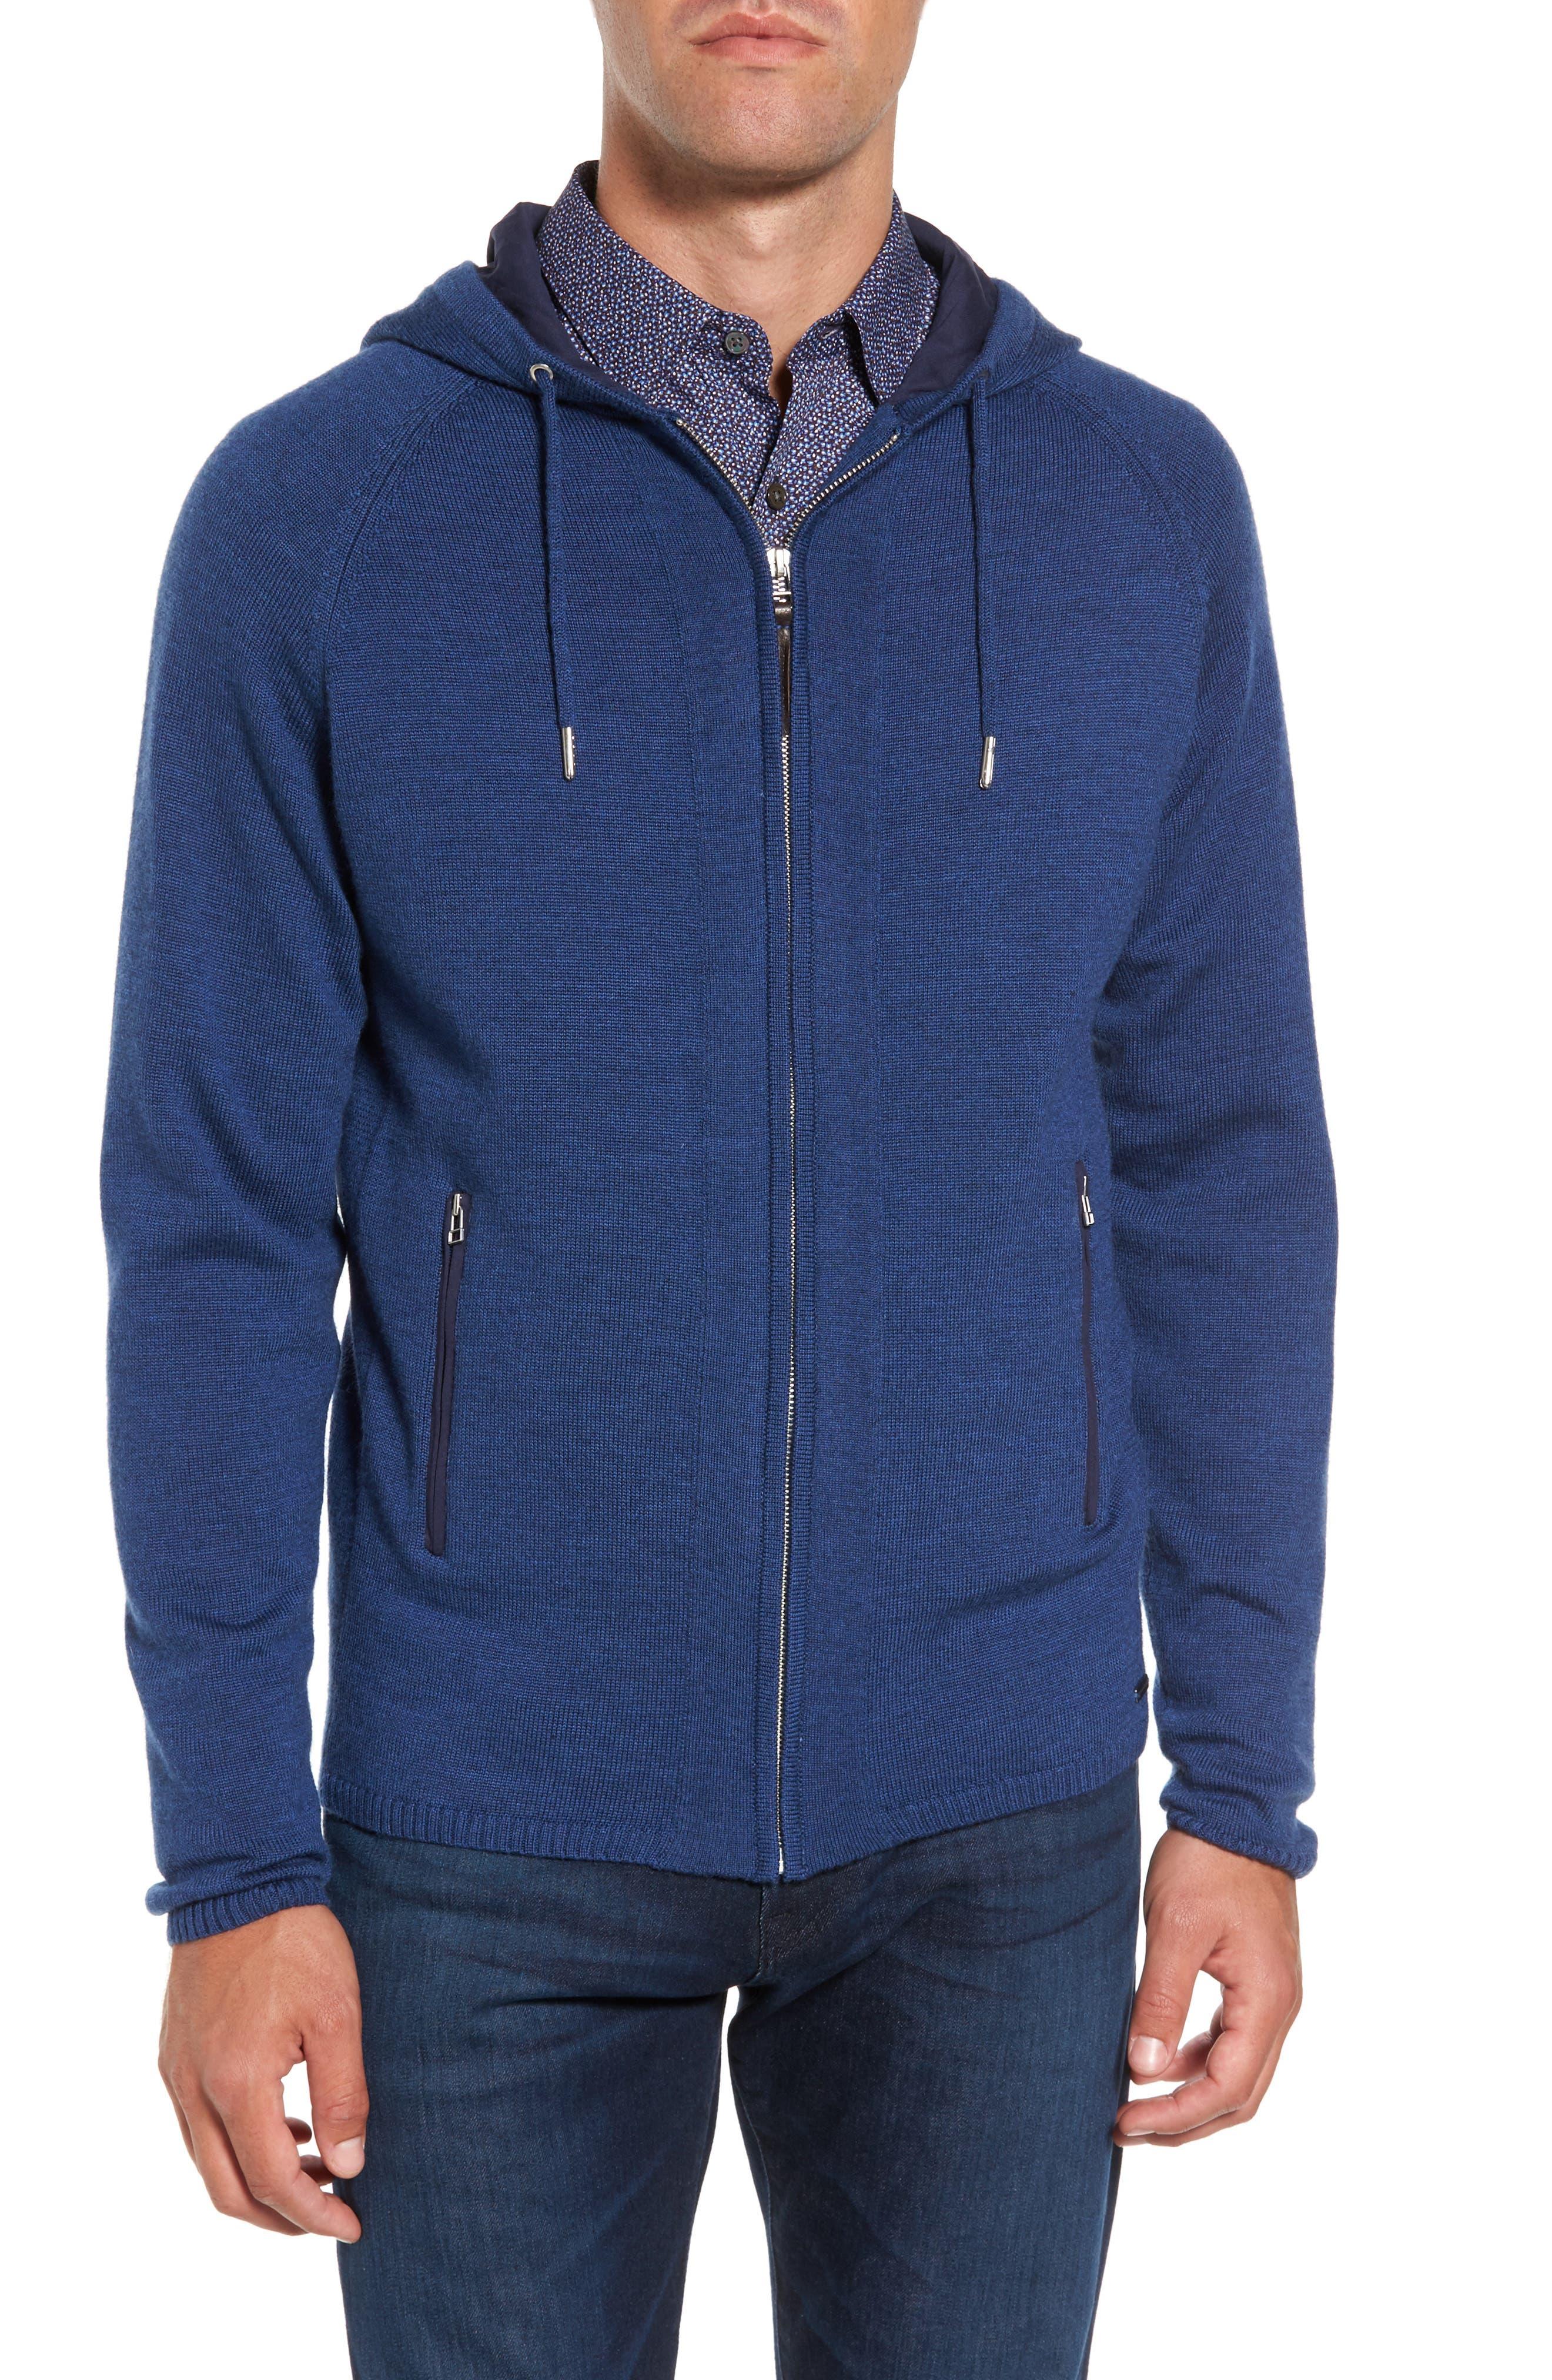 Main Image - Rodd & Gunn Grand Vue Hooded Zip Front Knit Sweater